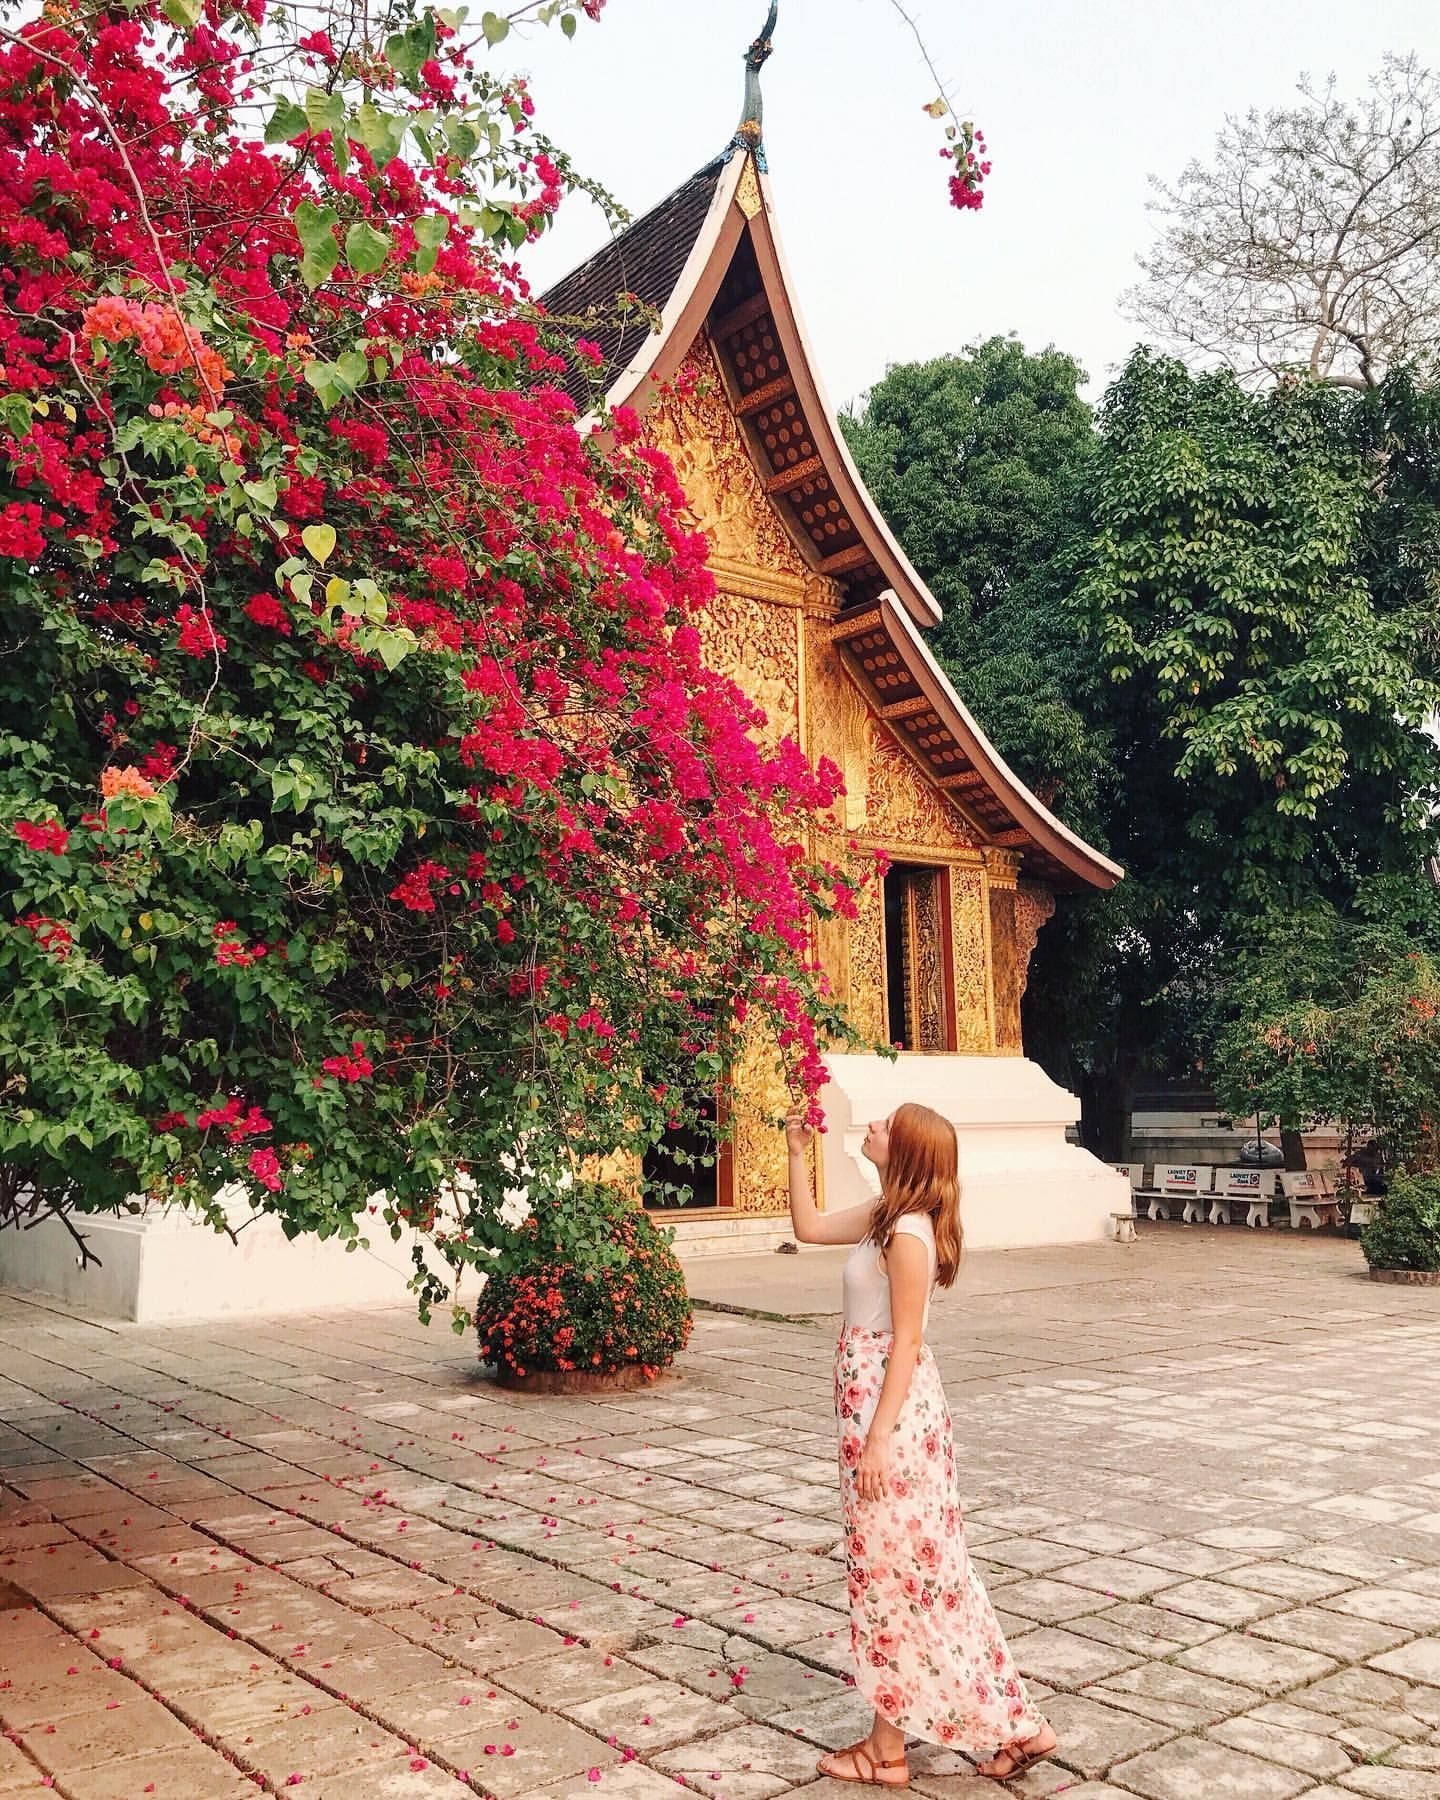 """Travel brings power and love back into your life."" ― Rumi Jalalud-Din  . . Post by @wanderlust.rachel . . Follow @wanderlust.rachel for more awesome content! . . #visitlaos #explorelaos #luangprabang #southeastasia #globetrotter #tasteintravel #mytinyatlas #prettylittletrips #dnescestujem #girlsabroad #travelgirlsgo #darlingescapes #girlsvsglobe #dametraveler #womenwhotravel #sheisnotlost #gltlove #wearetravelgirls #ladiesgoneglobal #globelletravels #shetravels #femmetravel .."